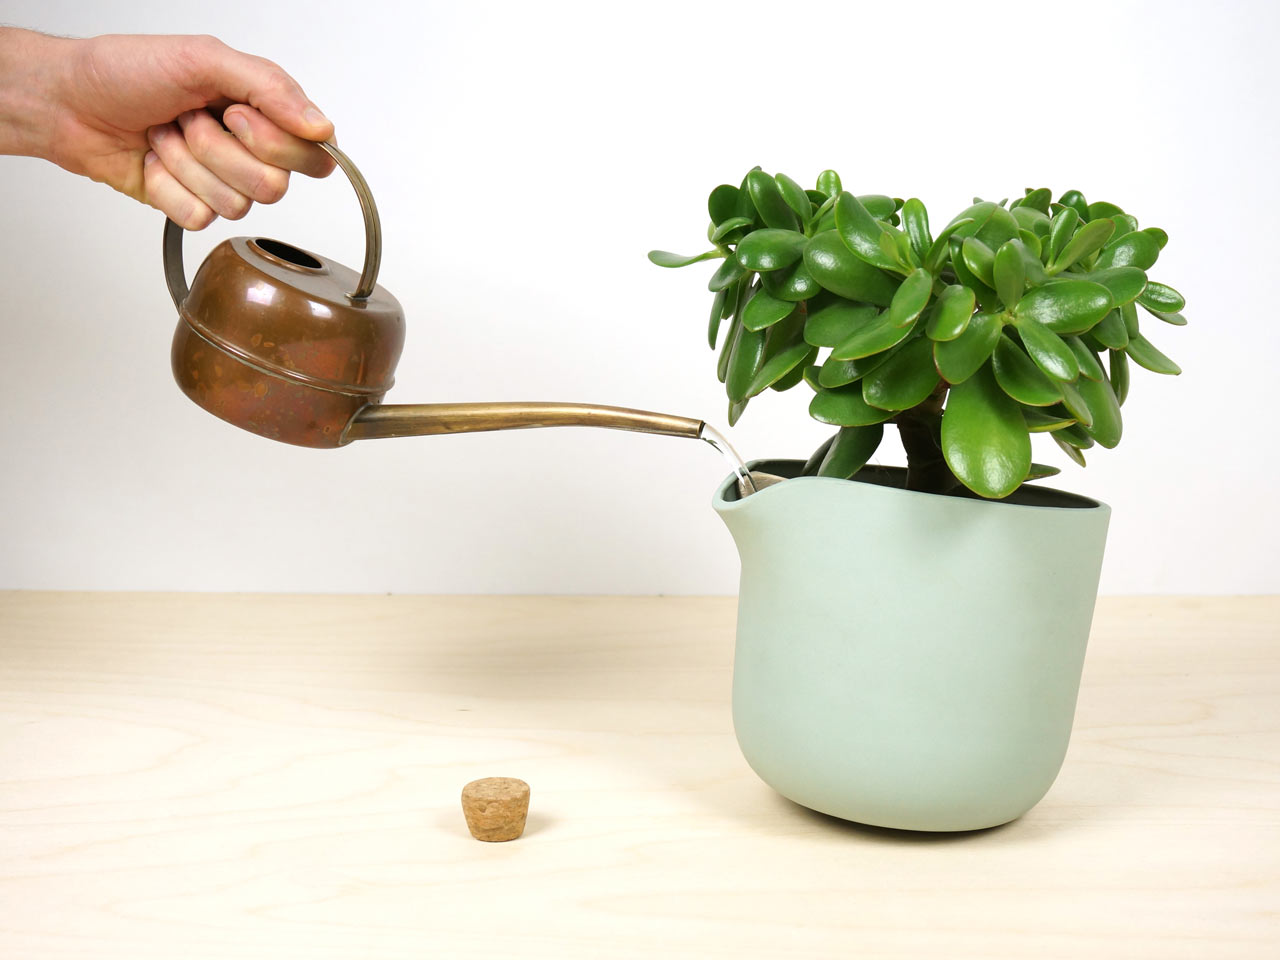 Studio Lorier's Self-Watering Flowerpot